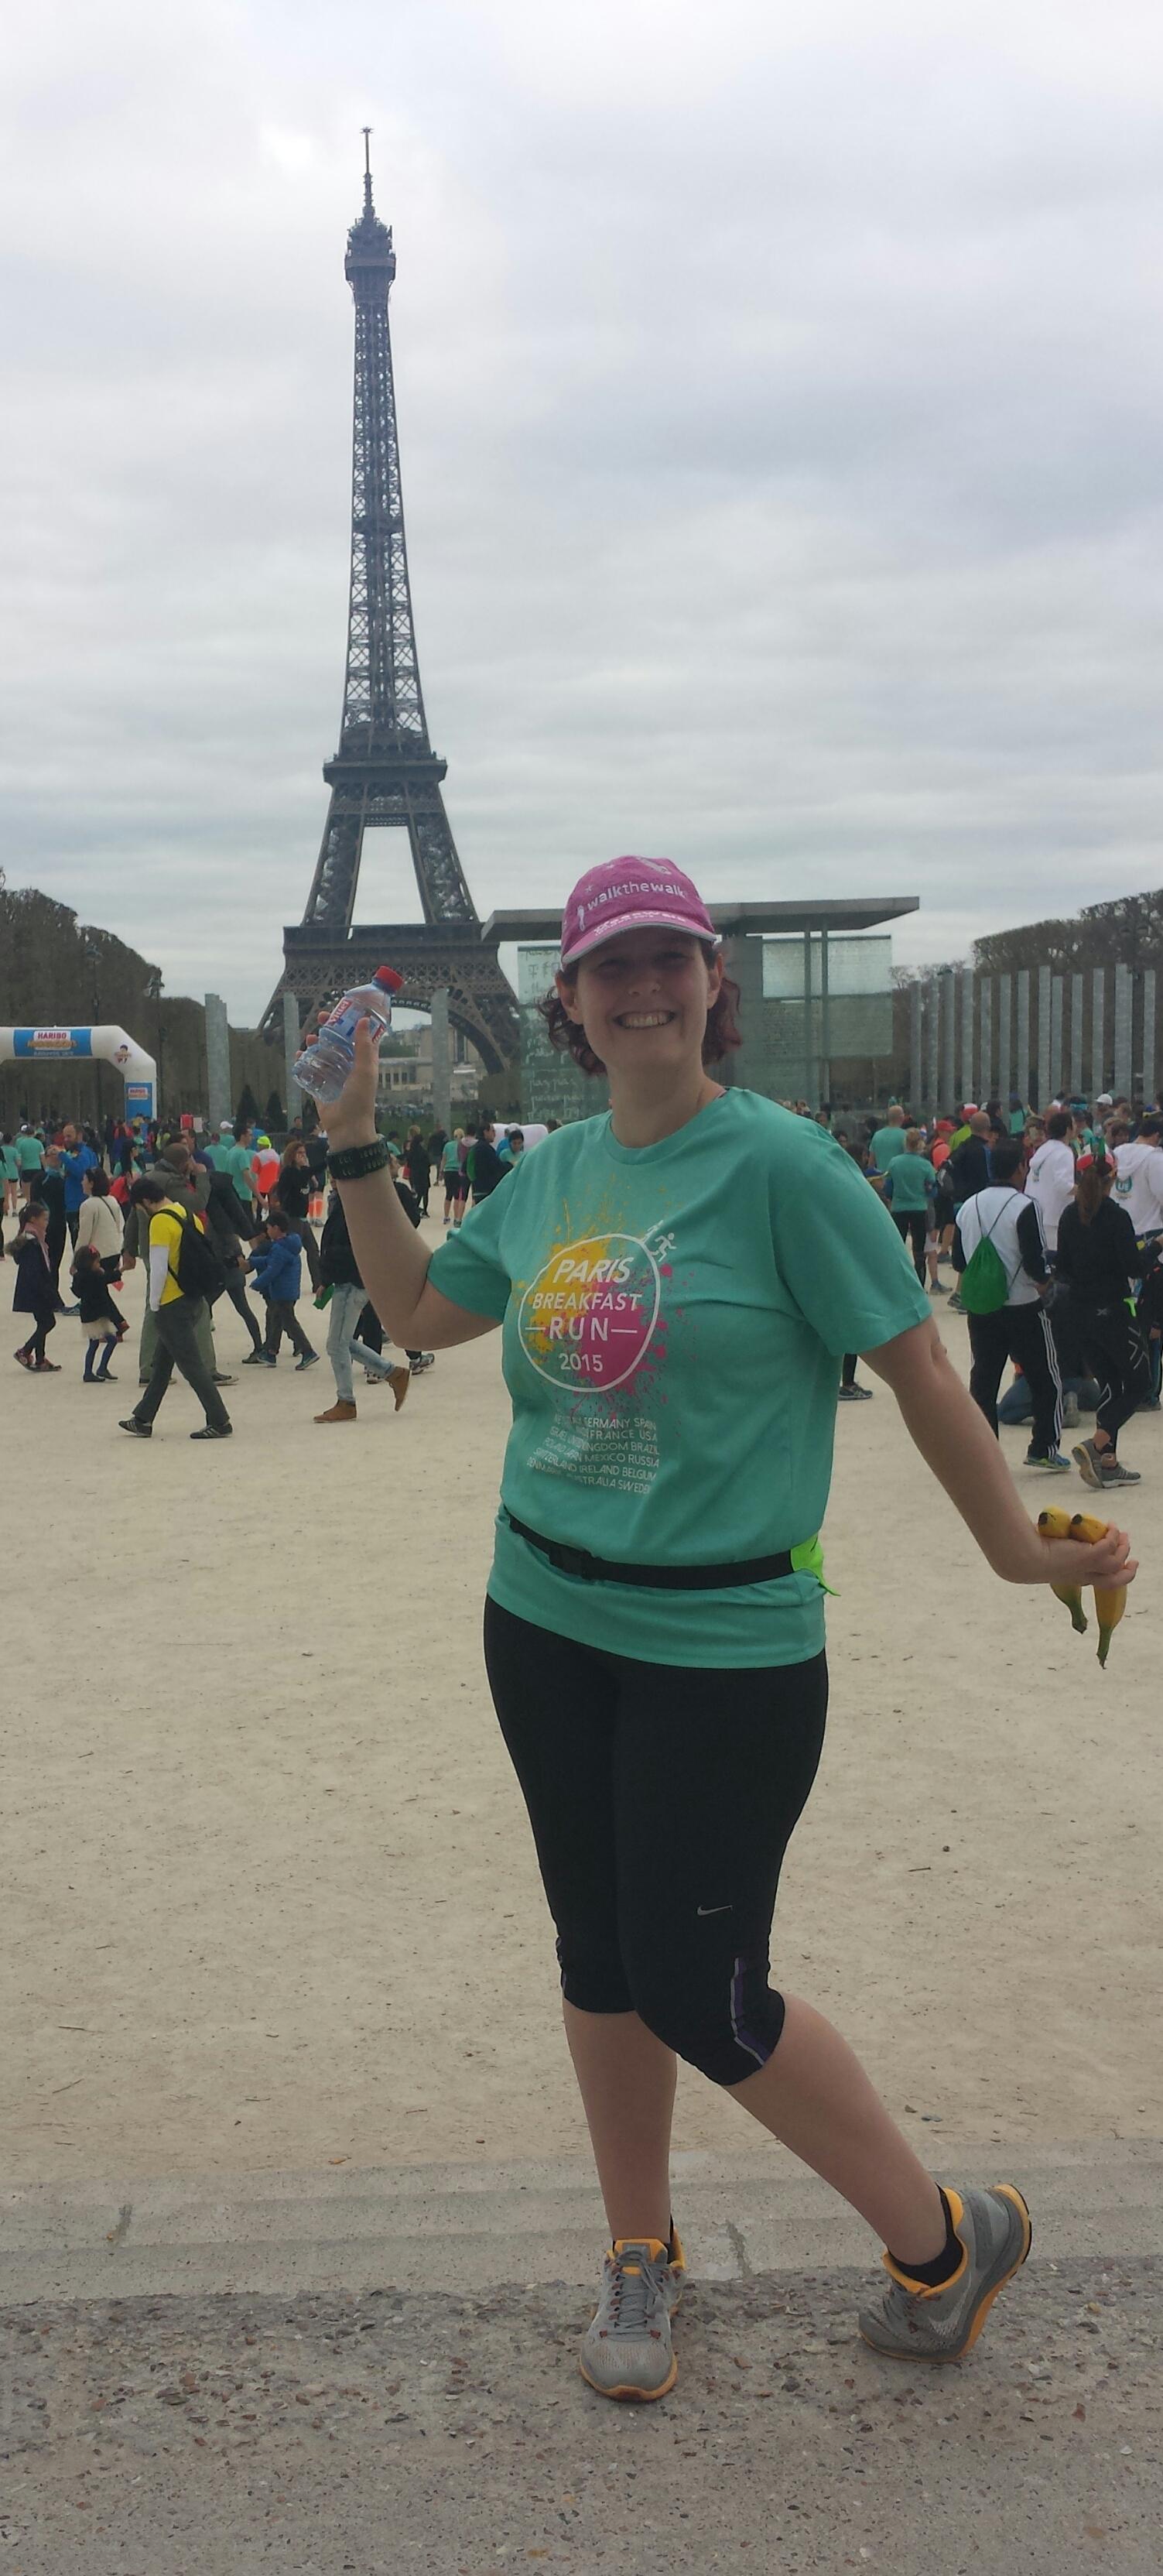 Paris Marathon 5km Breakfast Run 2015